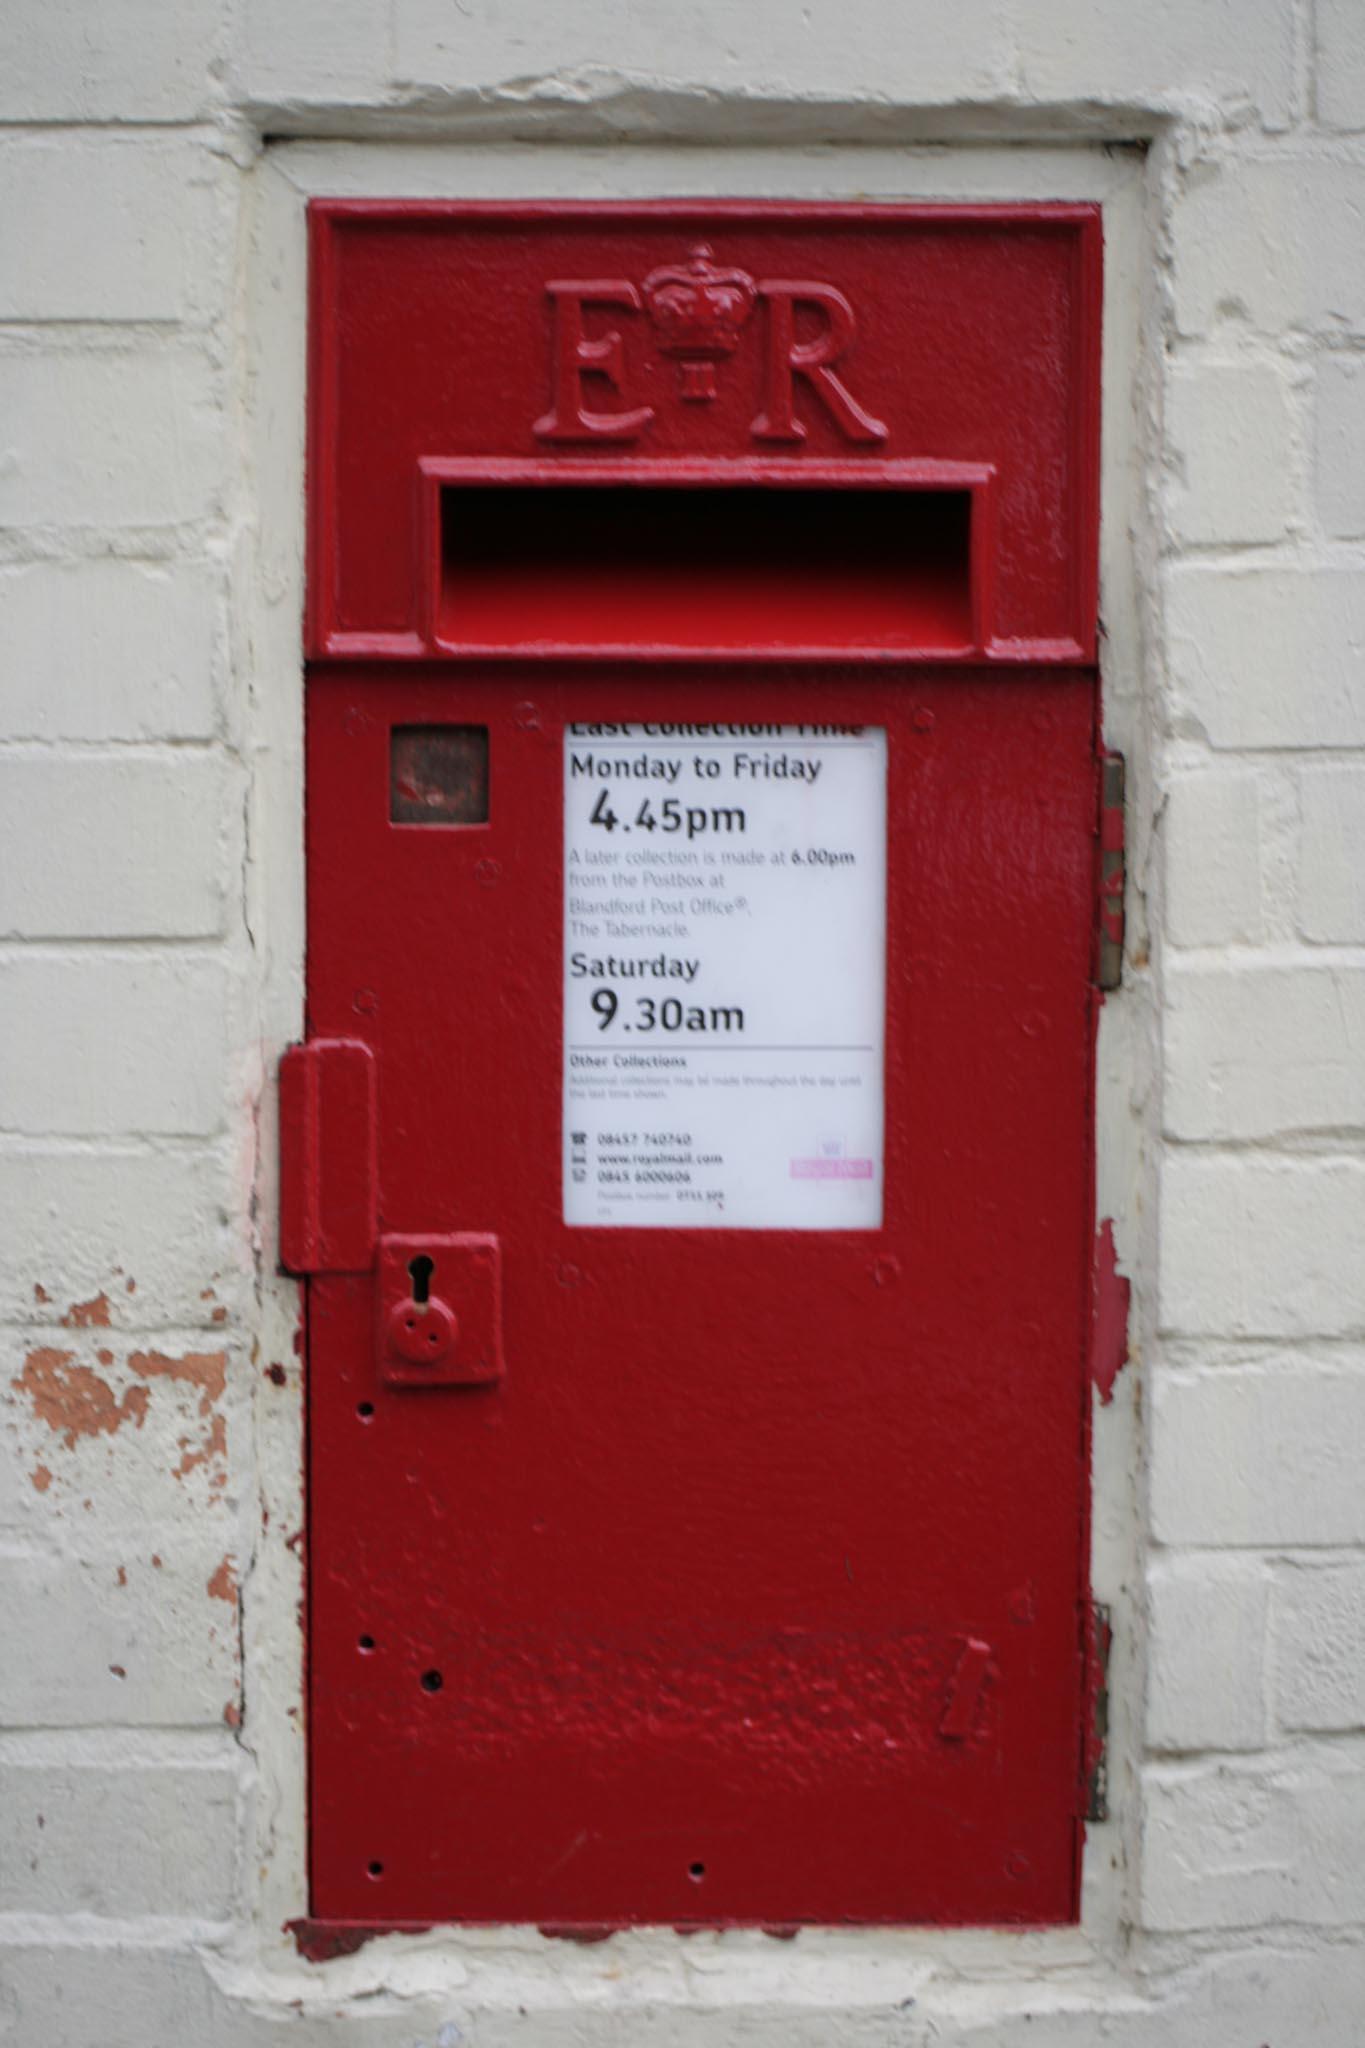 E2R Ludlow wall box, 1950s, Dorset. Robert Cole